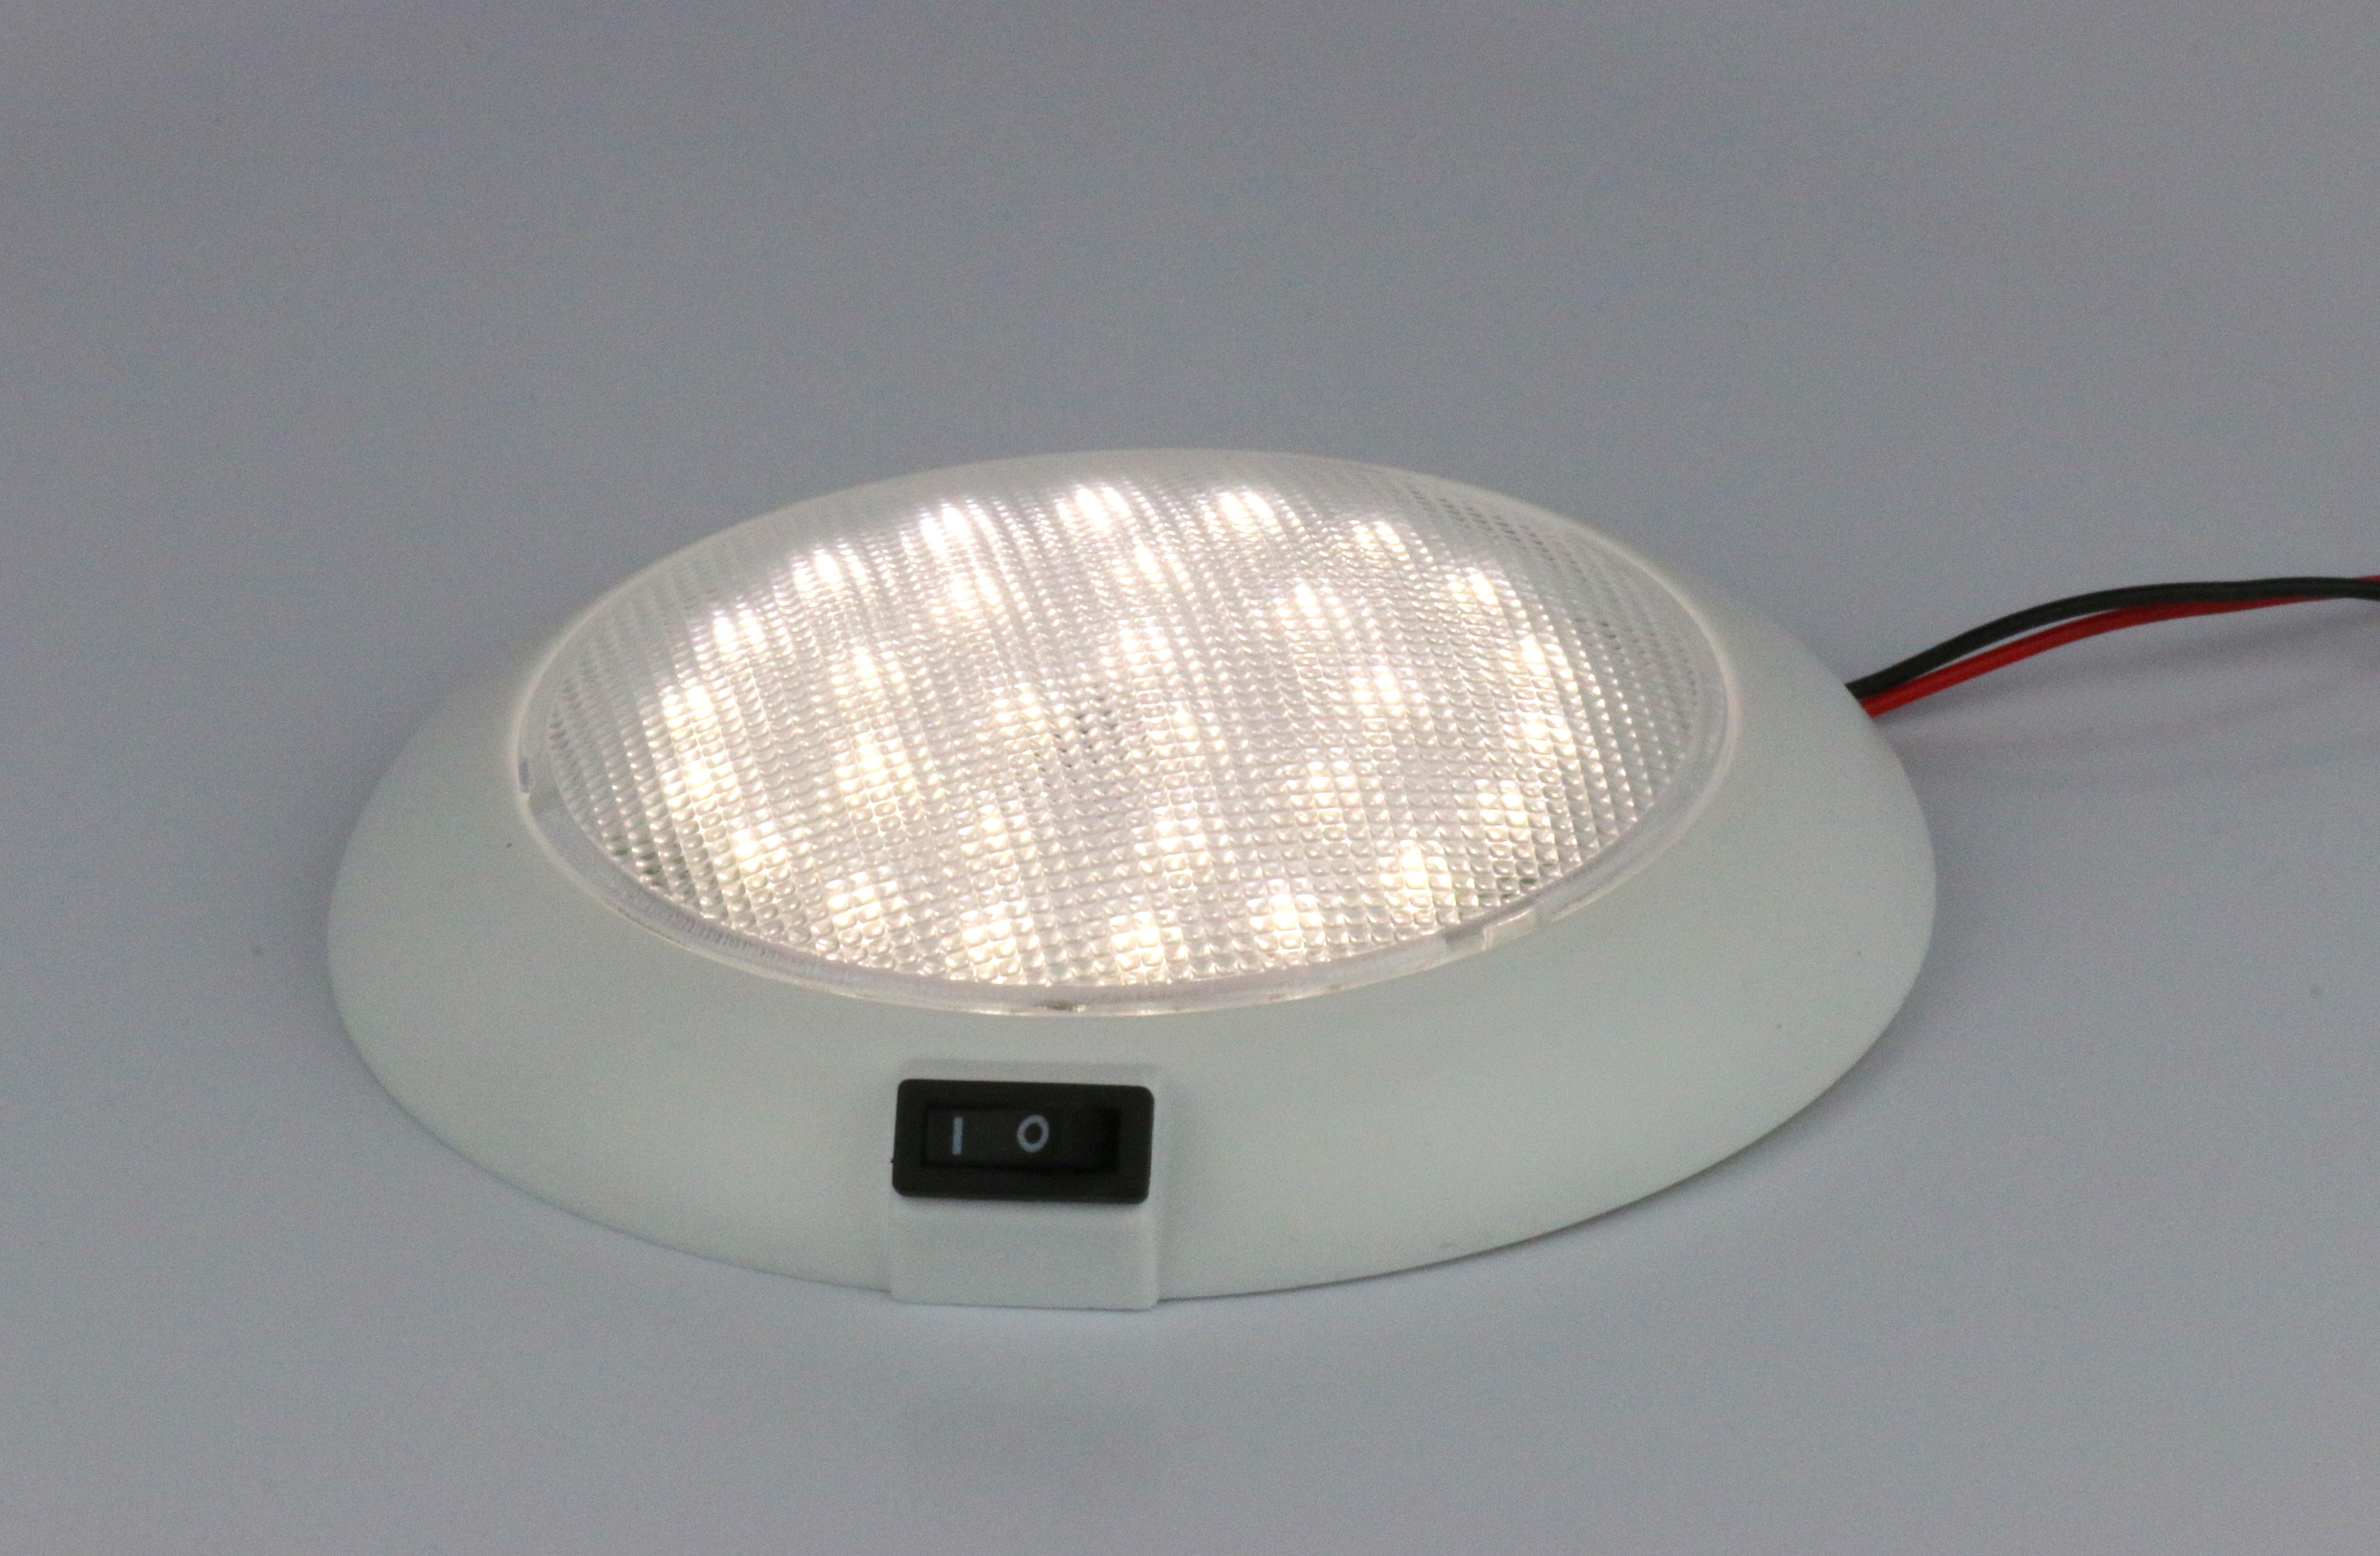 Led dome light high power 55 12vdc 150 lumens led dome light high power 55 12vdc 150 lumens arubaitofo Gallery